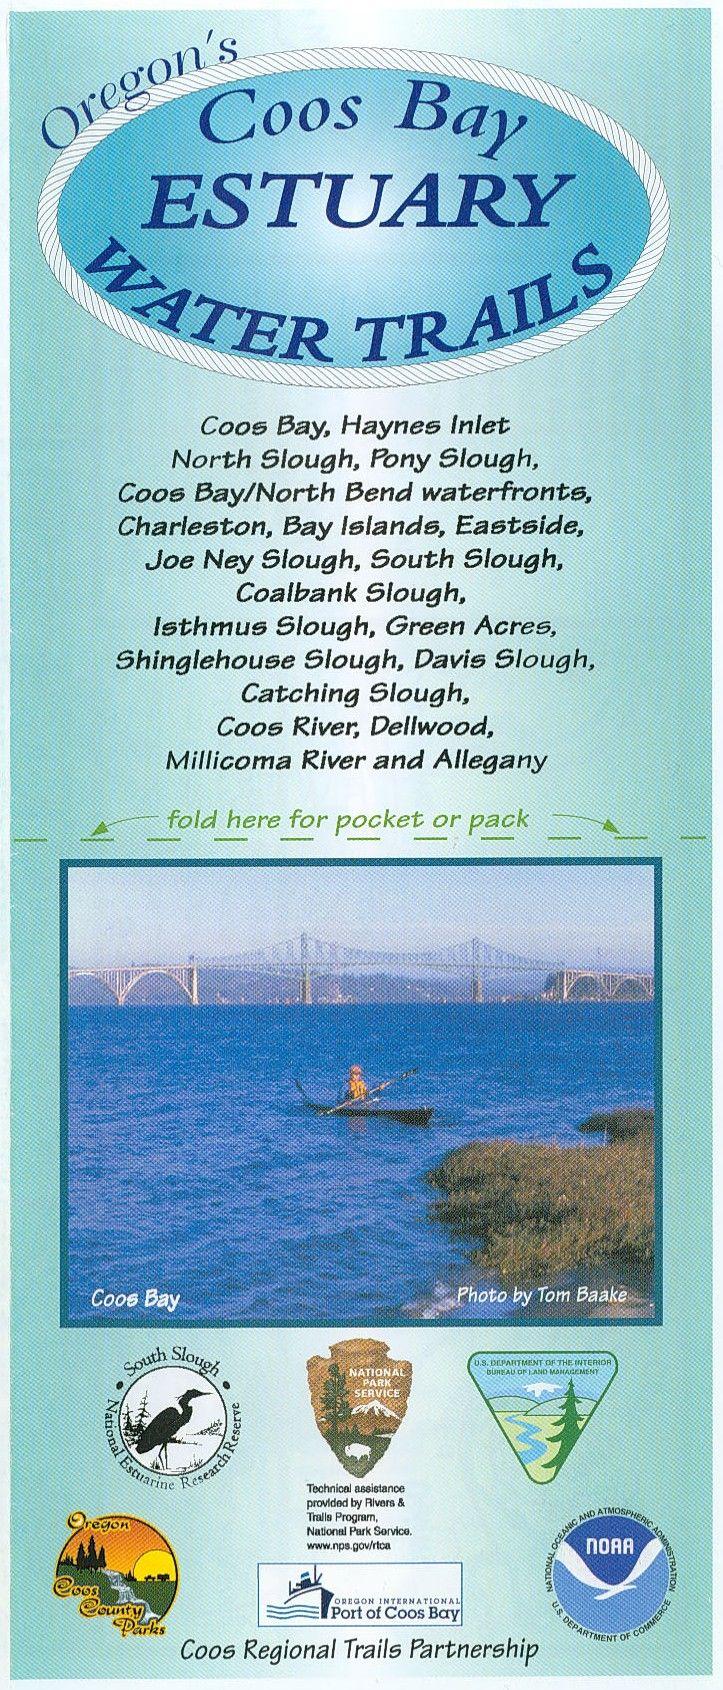 Coos bay oregon estuary allegany